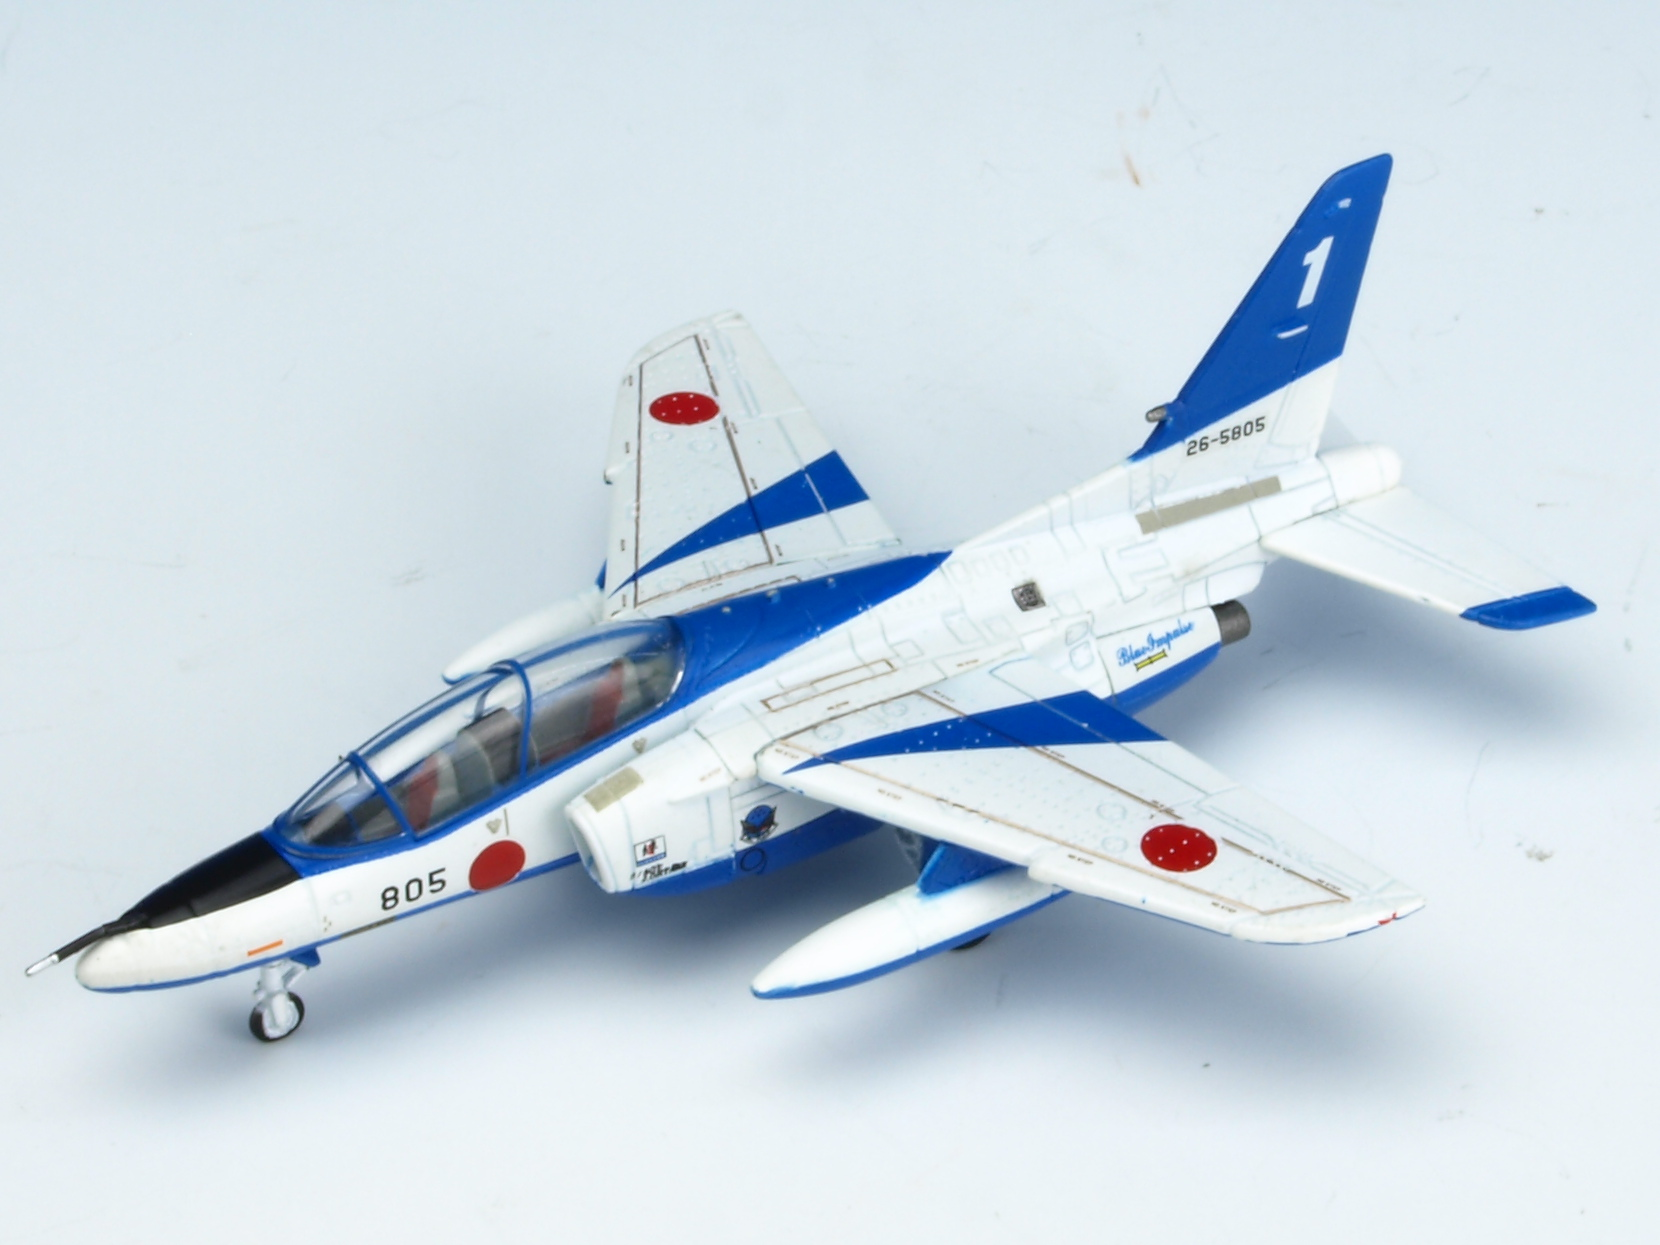 Avioni-X 川崎 T-4 ブルーインパルス #1(26-5805)